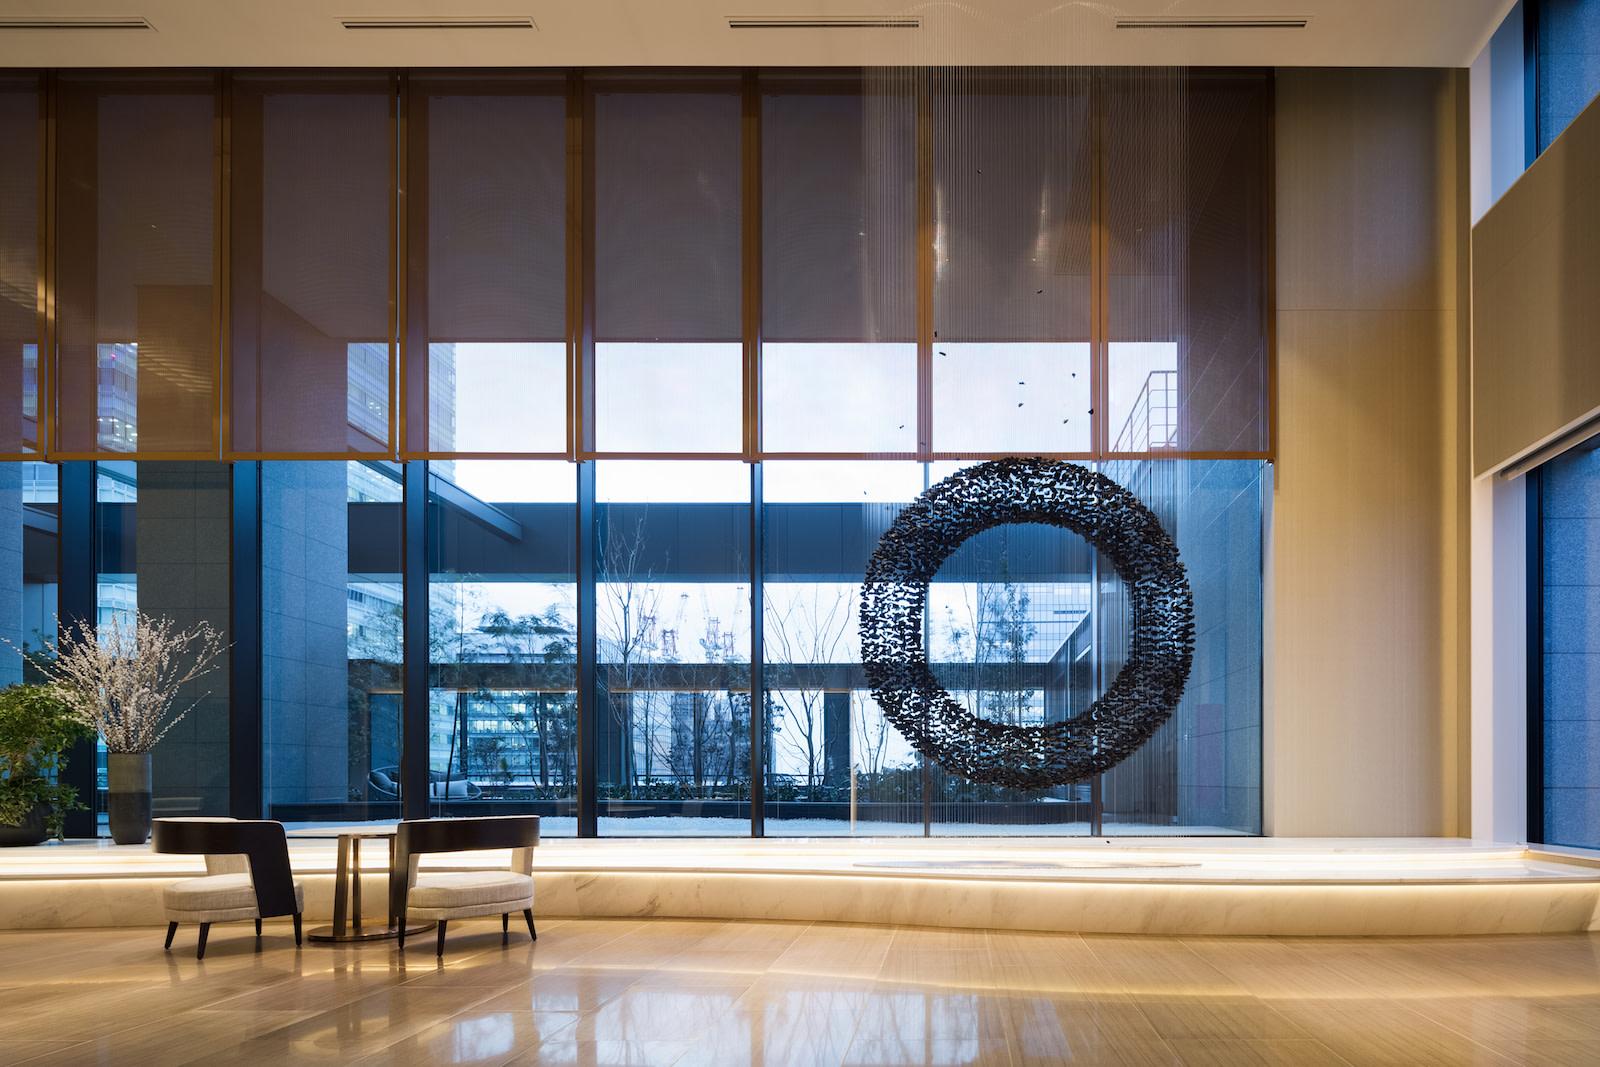 SR Japan Tokyo Asc Marunouchi Lobby Art-HR アスコット丸の内東京 | Workations(ワーケーションズ)